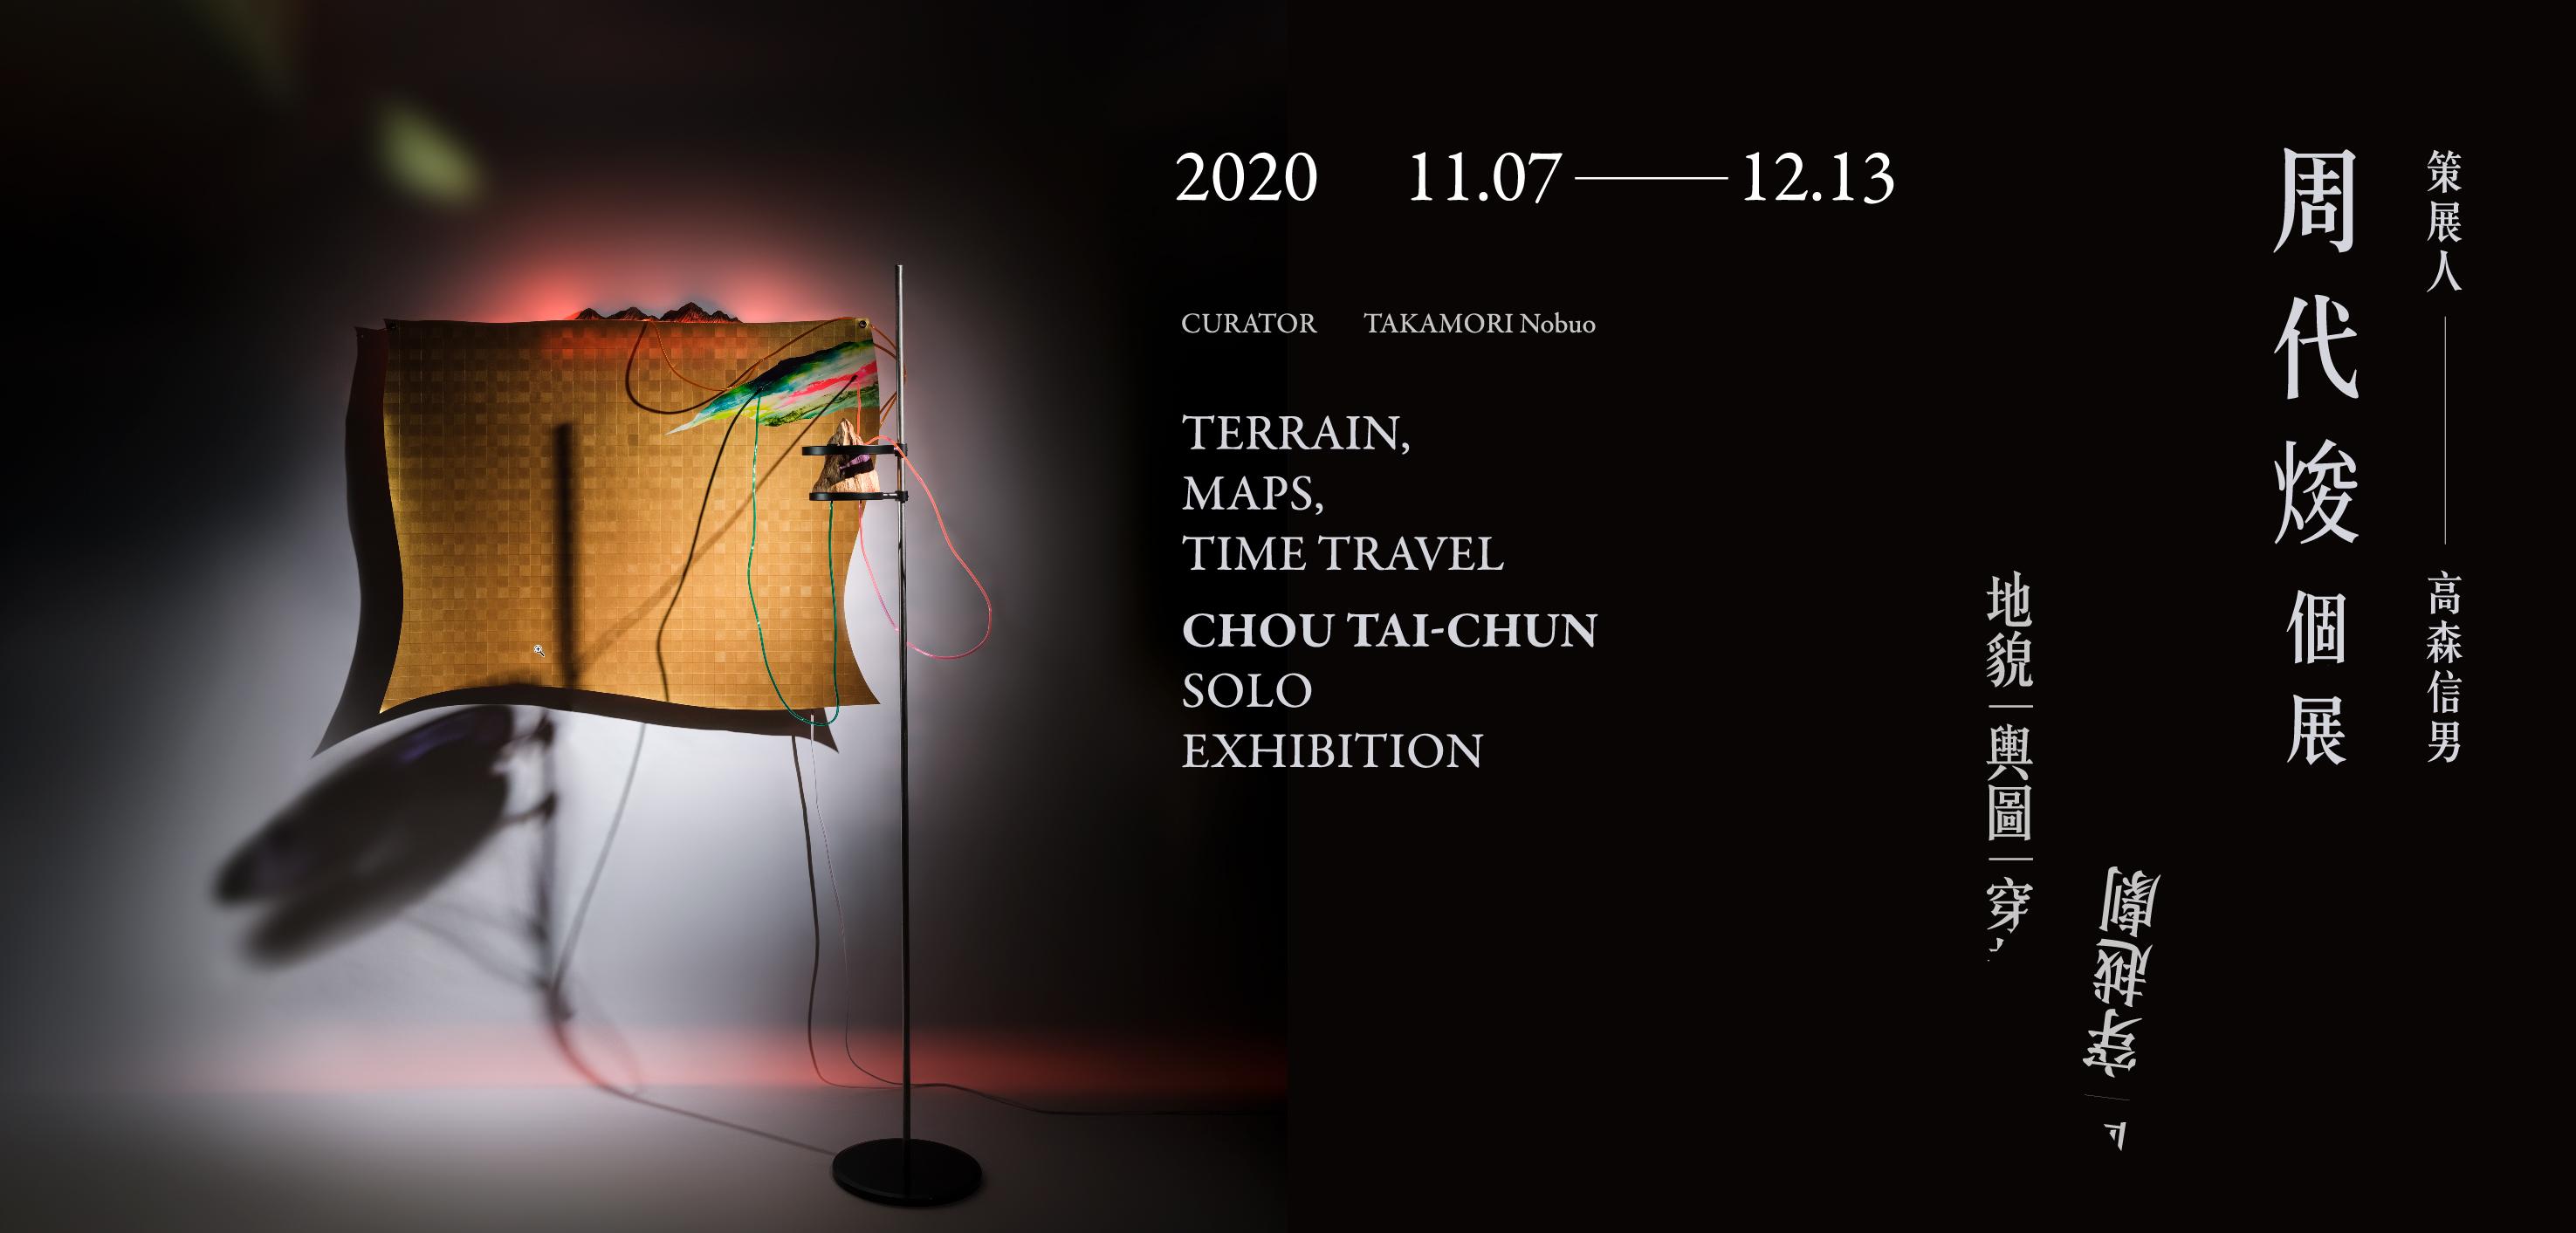 Terrain, Maps, Time Travel—CHOUTai-Chun's Solo Exhibition